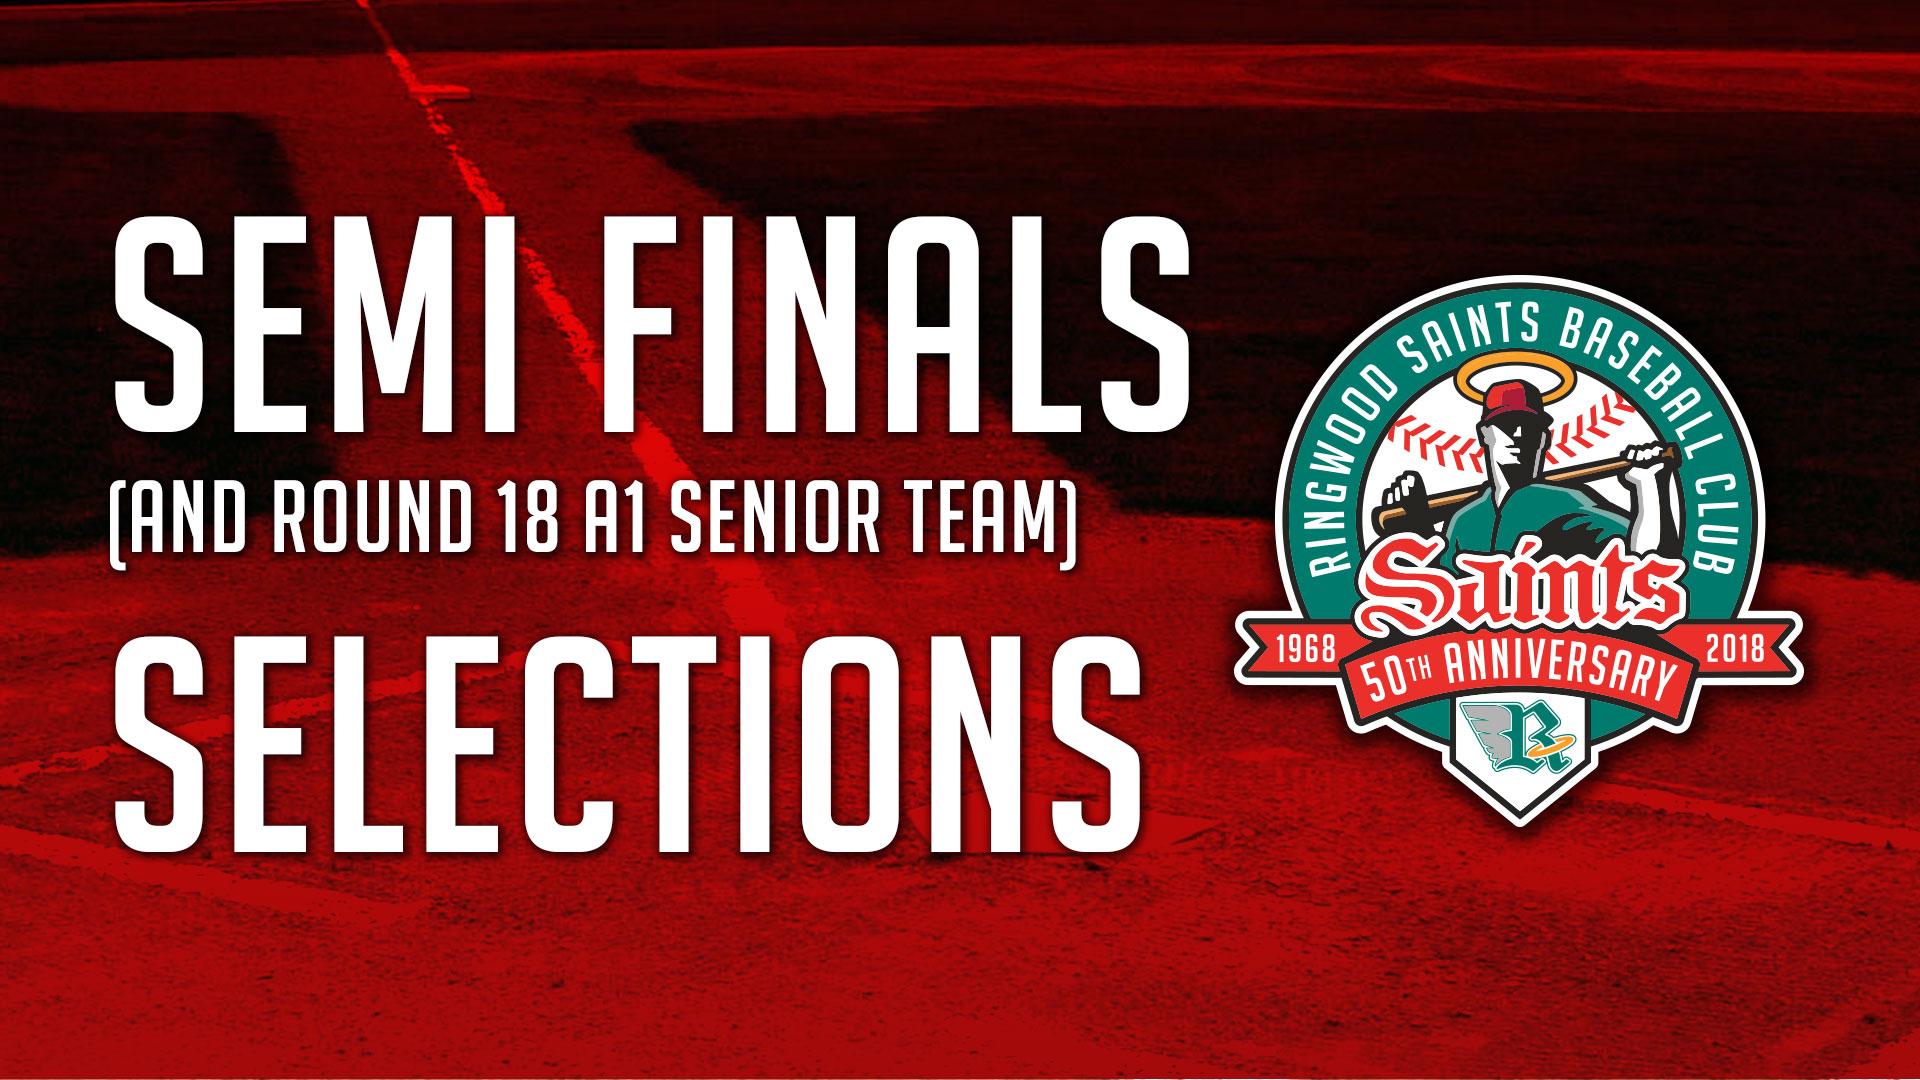 Senior Teams: Semi Finals & Round 18, 18th August